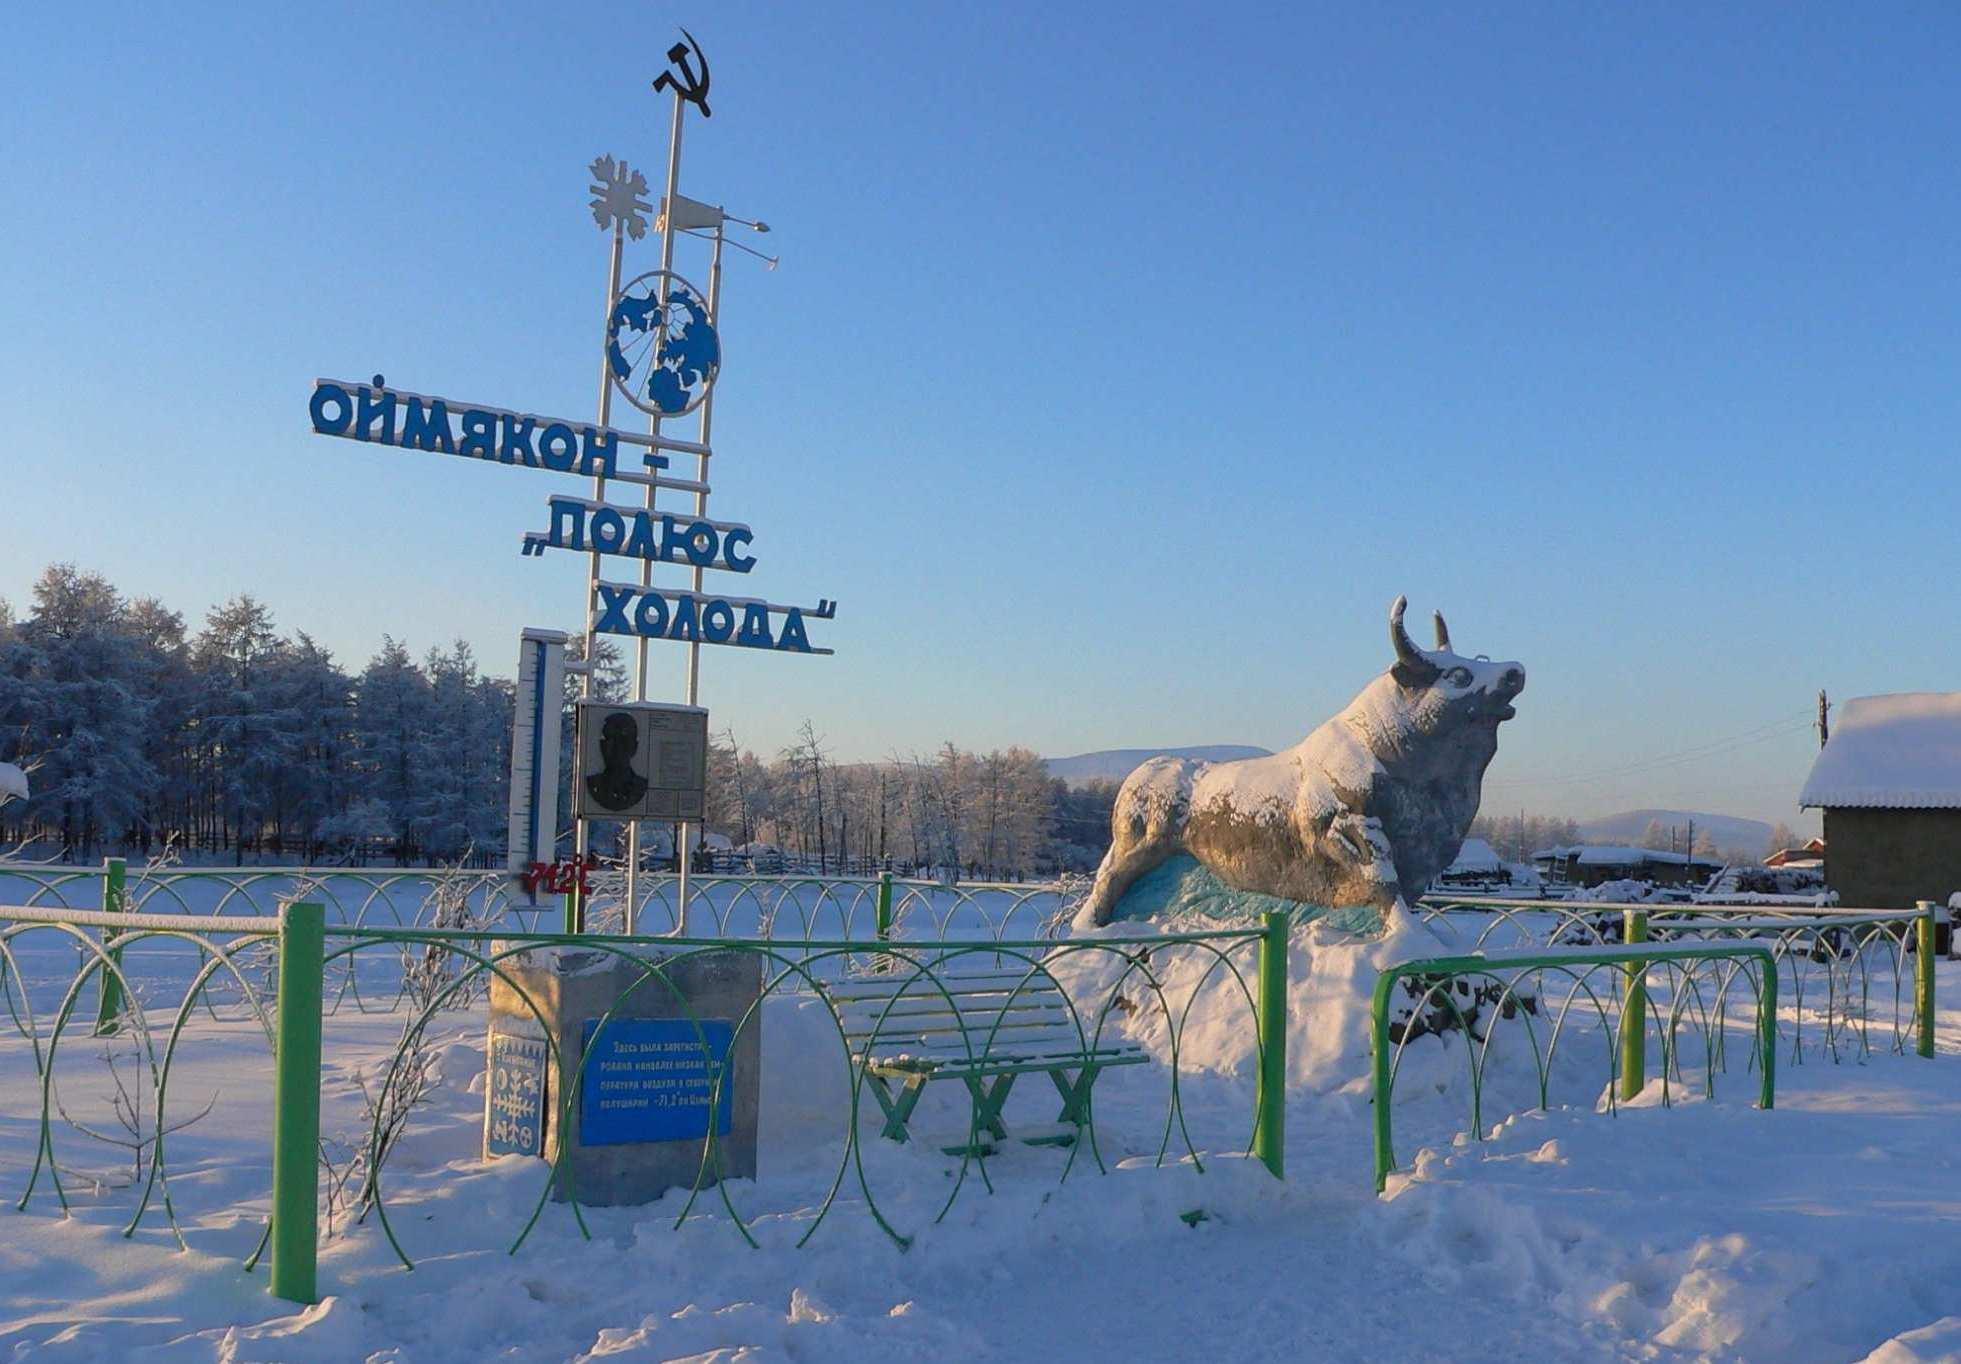 Село Оймякон в Якутии зимой